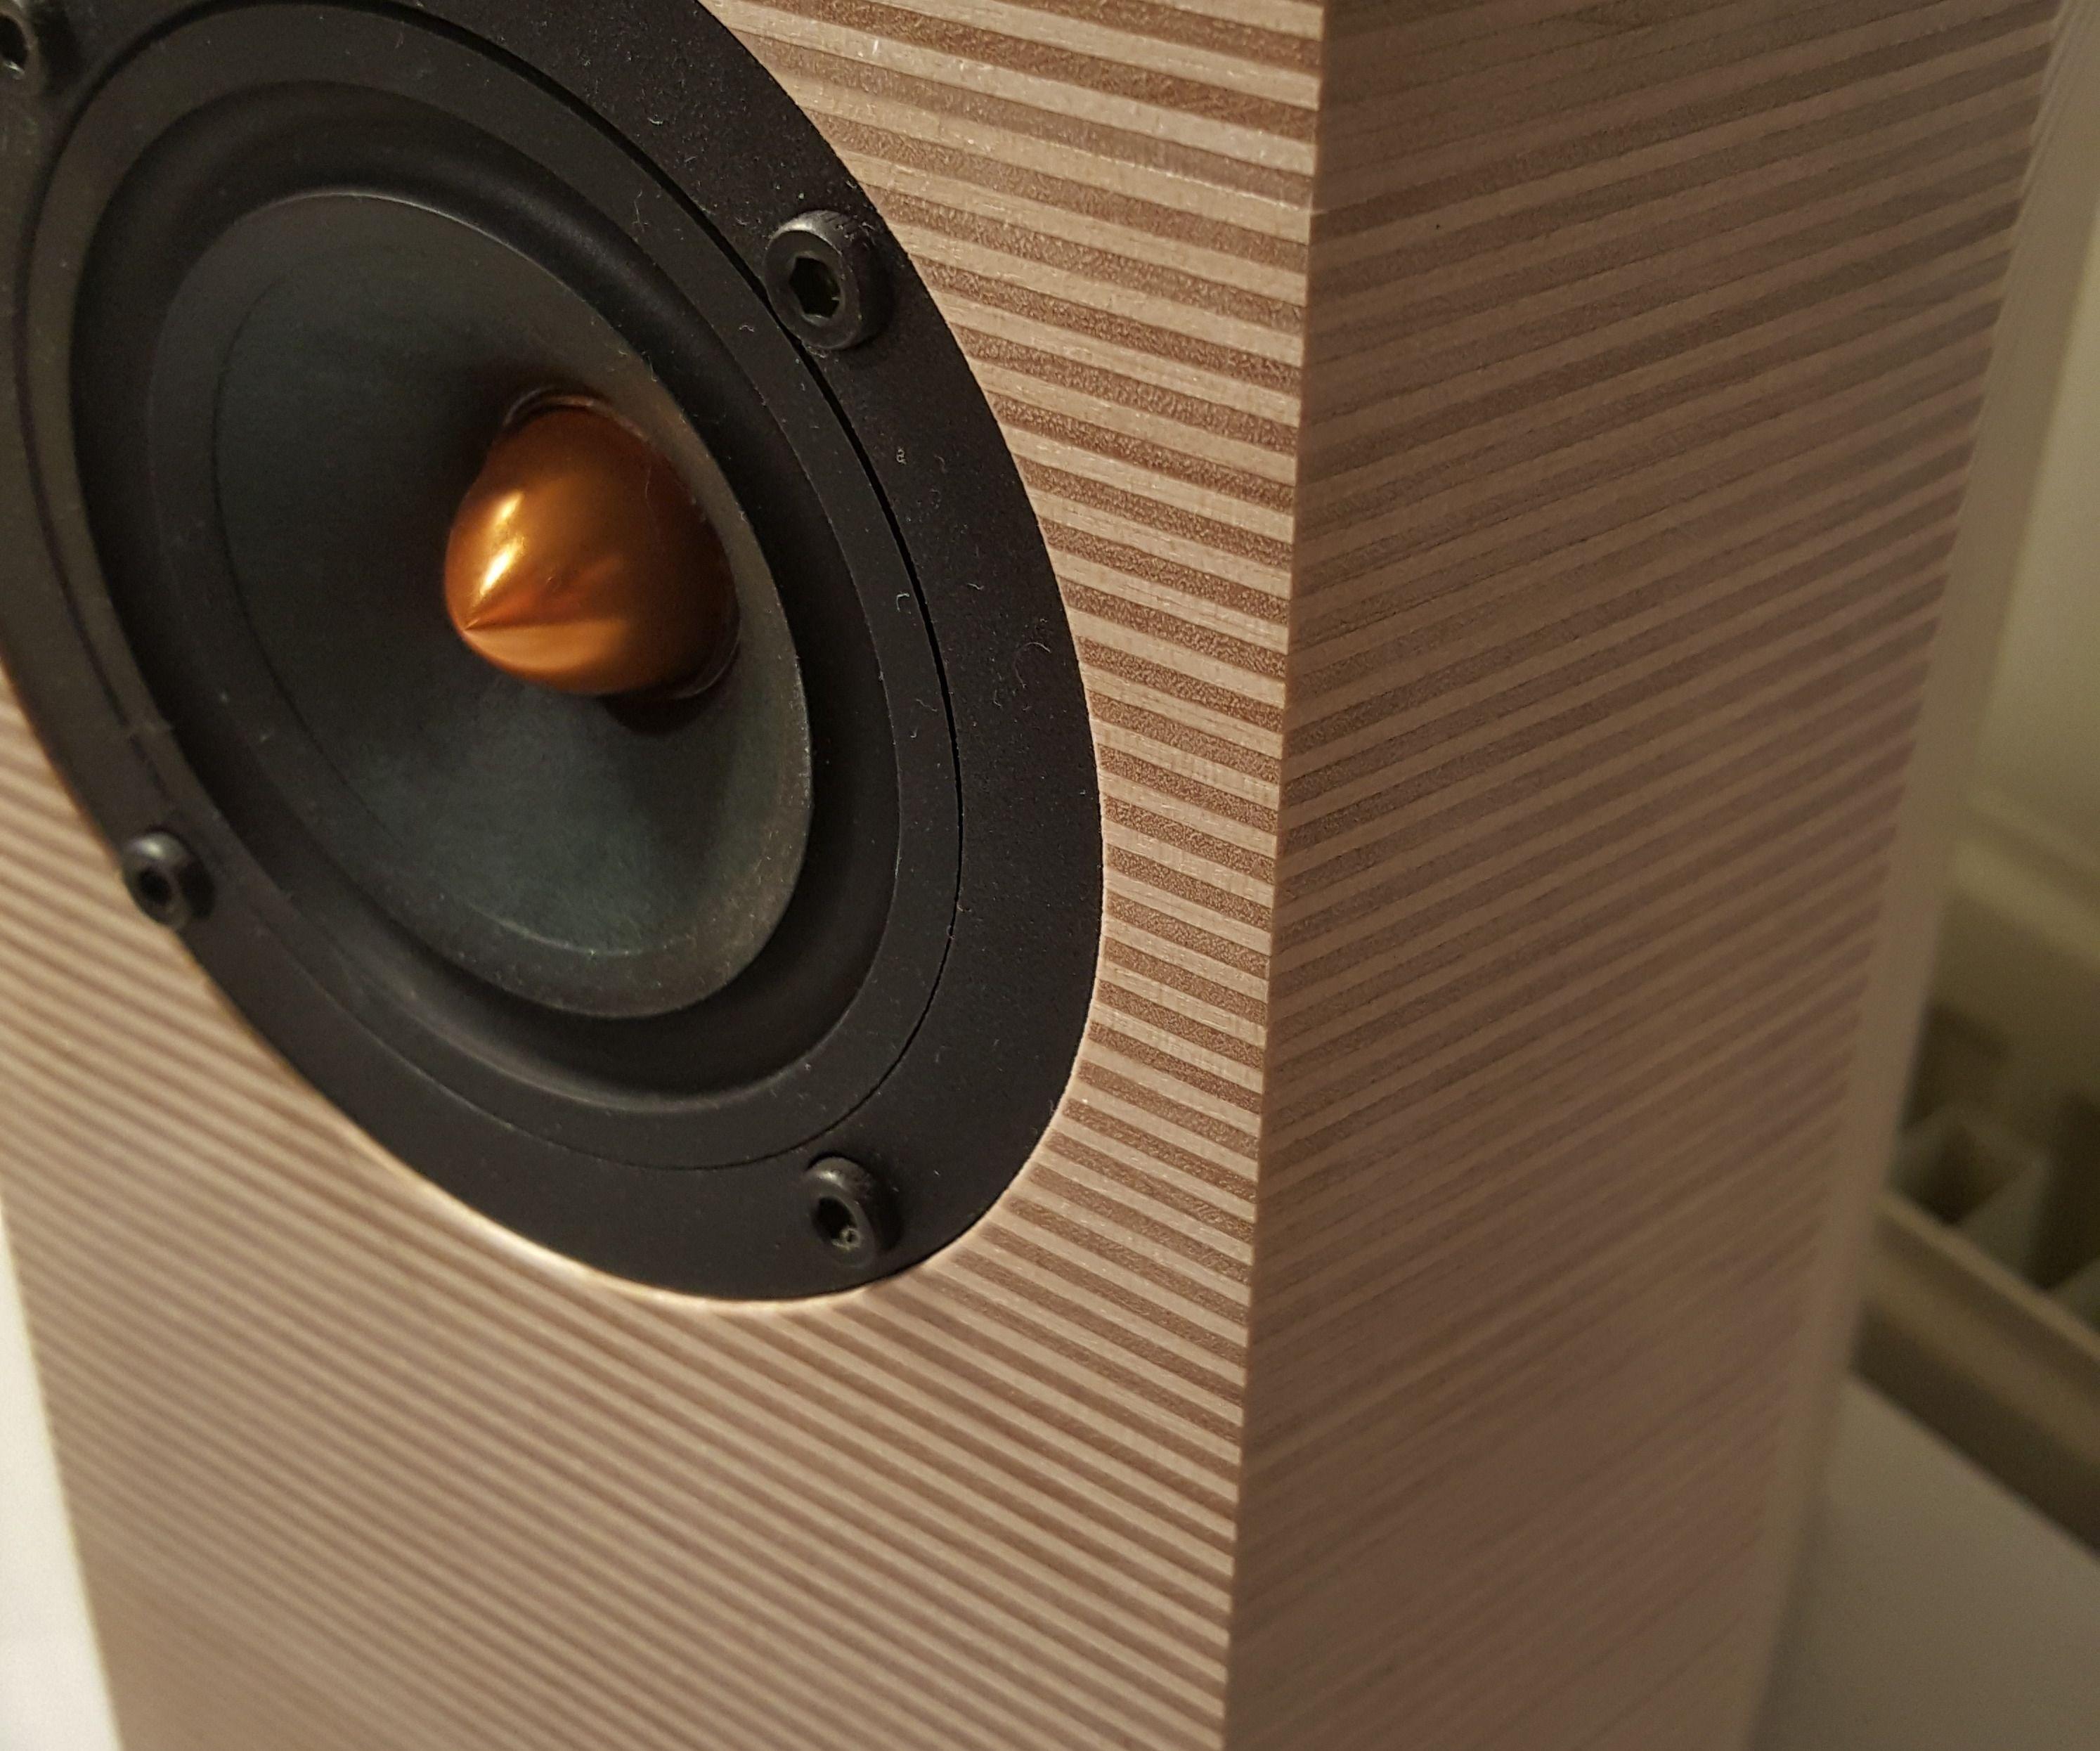 LK Audio Mini Monitor speakers (bookshelf)